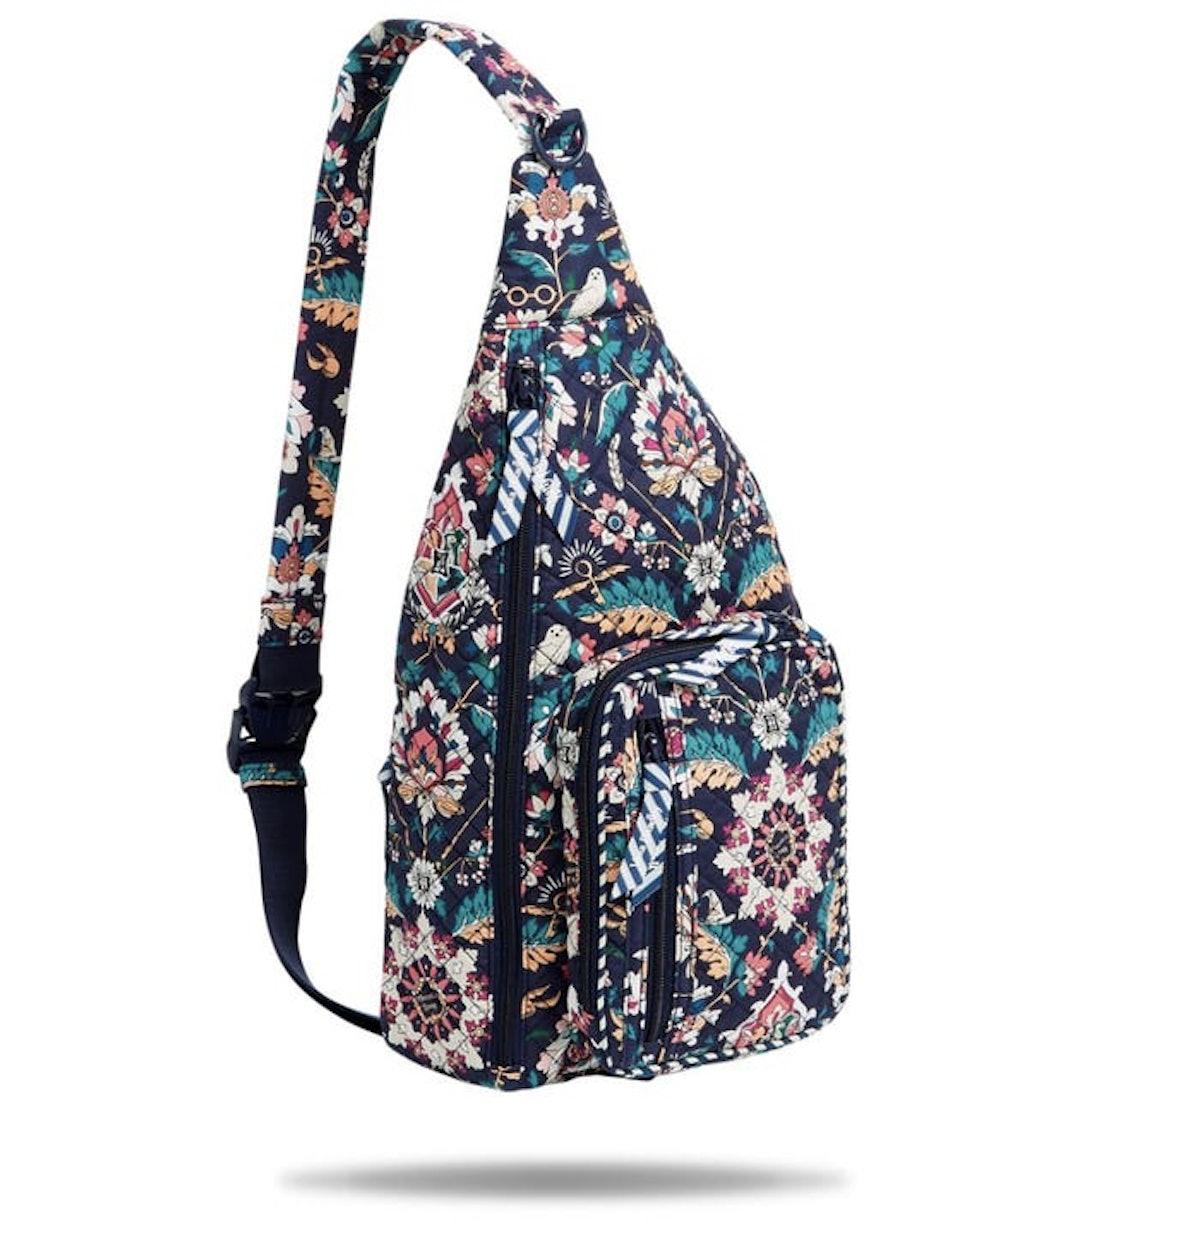 Harry Potter x Vera Bradley Sling Backpack in Home to Hogwarts